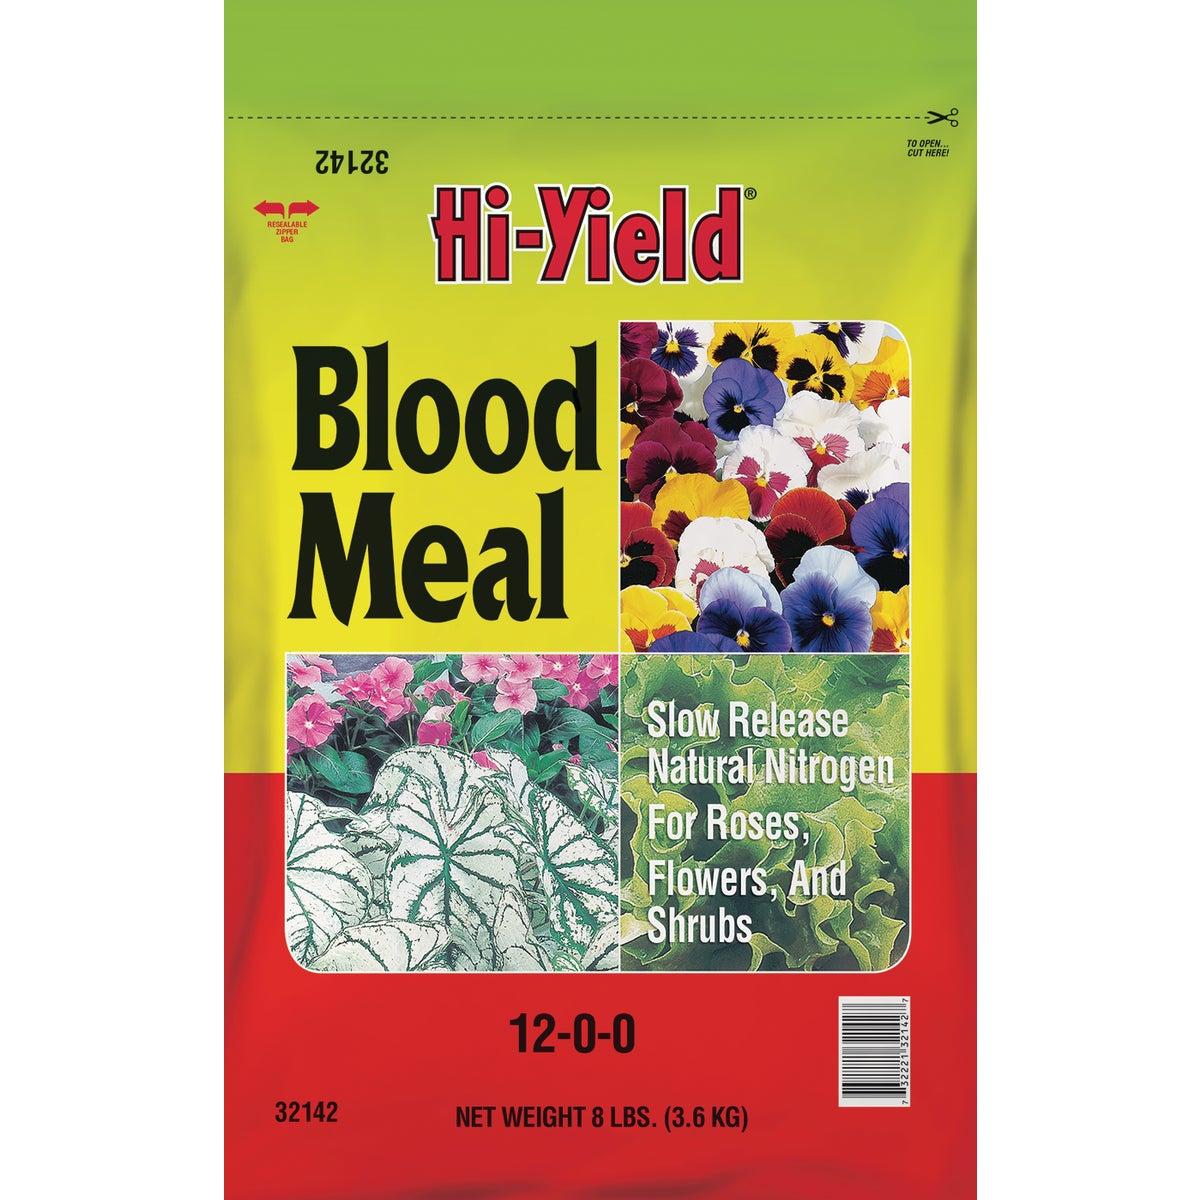 8LB BLOOD MEAL - 32142 by Vpg Fertilome